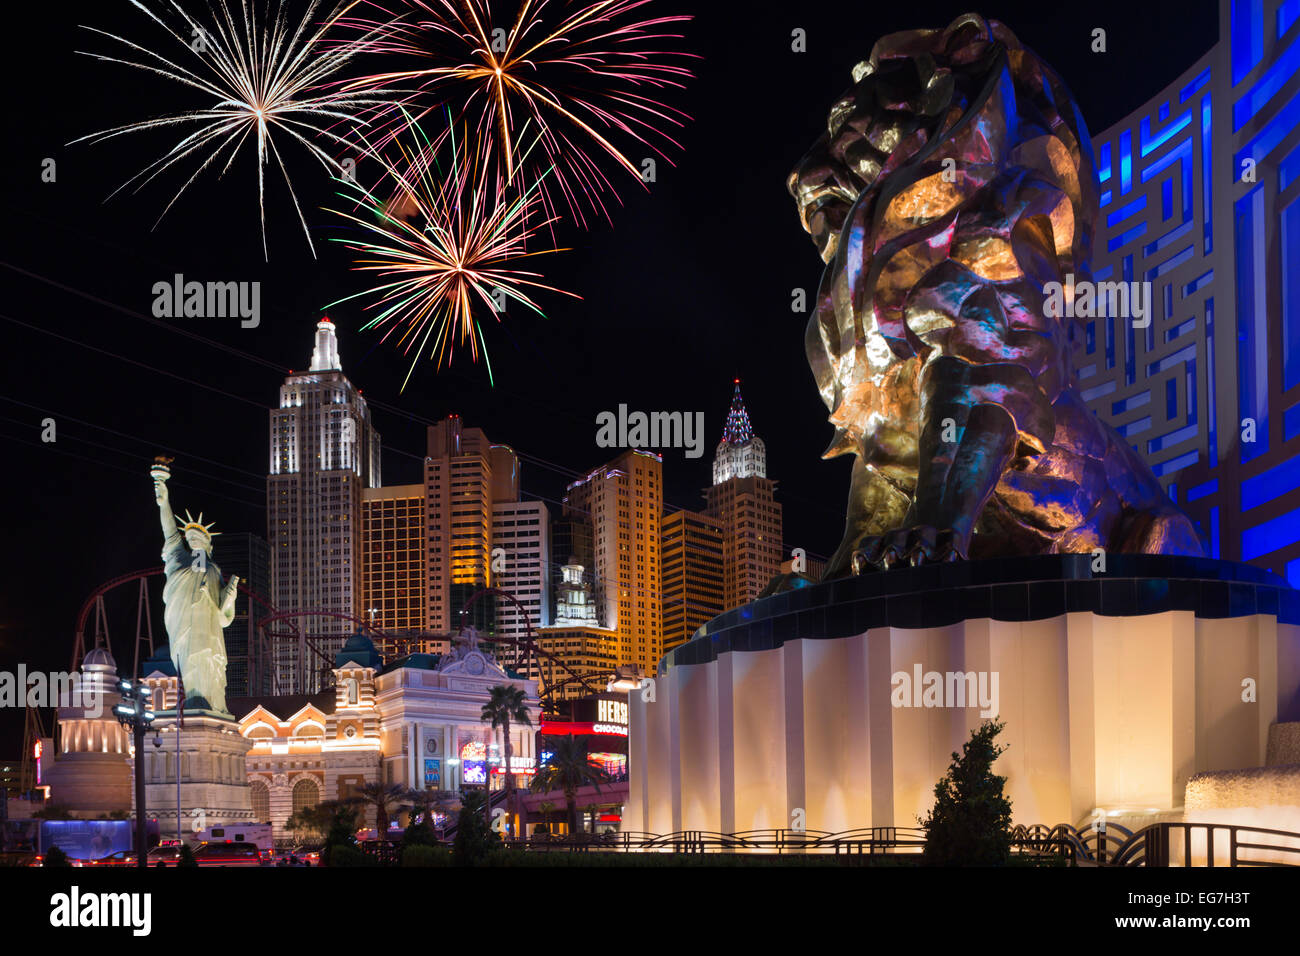 LION MGM GRAND NEW YORK NEW YORK HOTEL CASINOS THE STRIP LAS VEGAS NEVADA USA - Stock Image